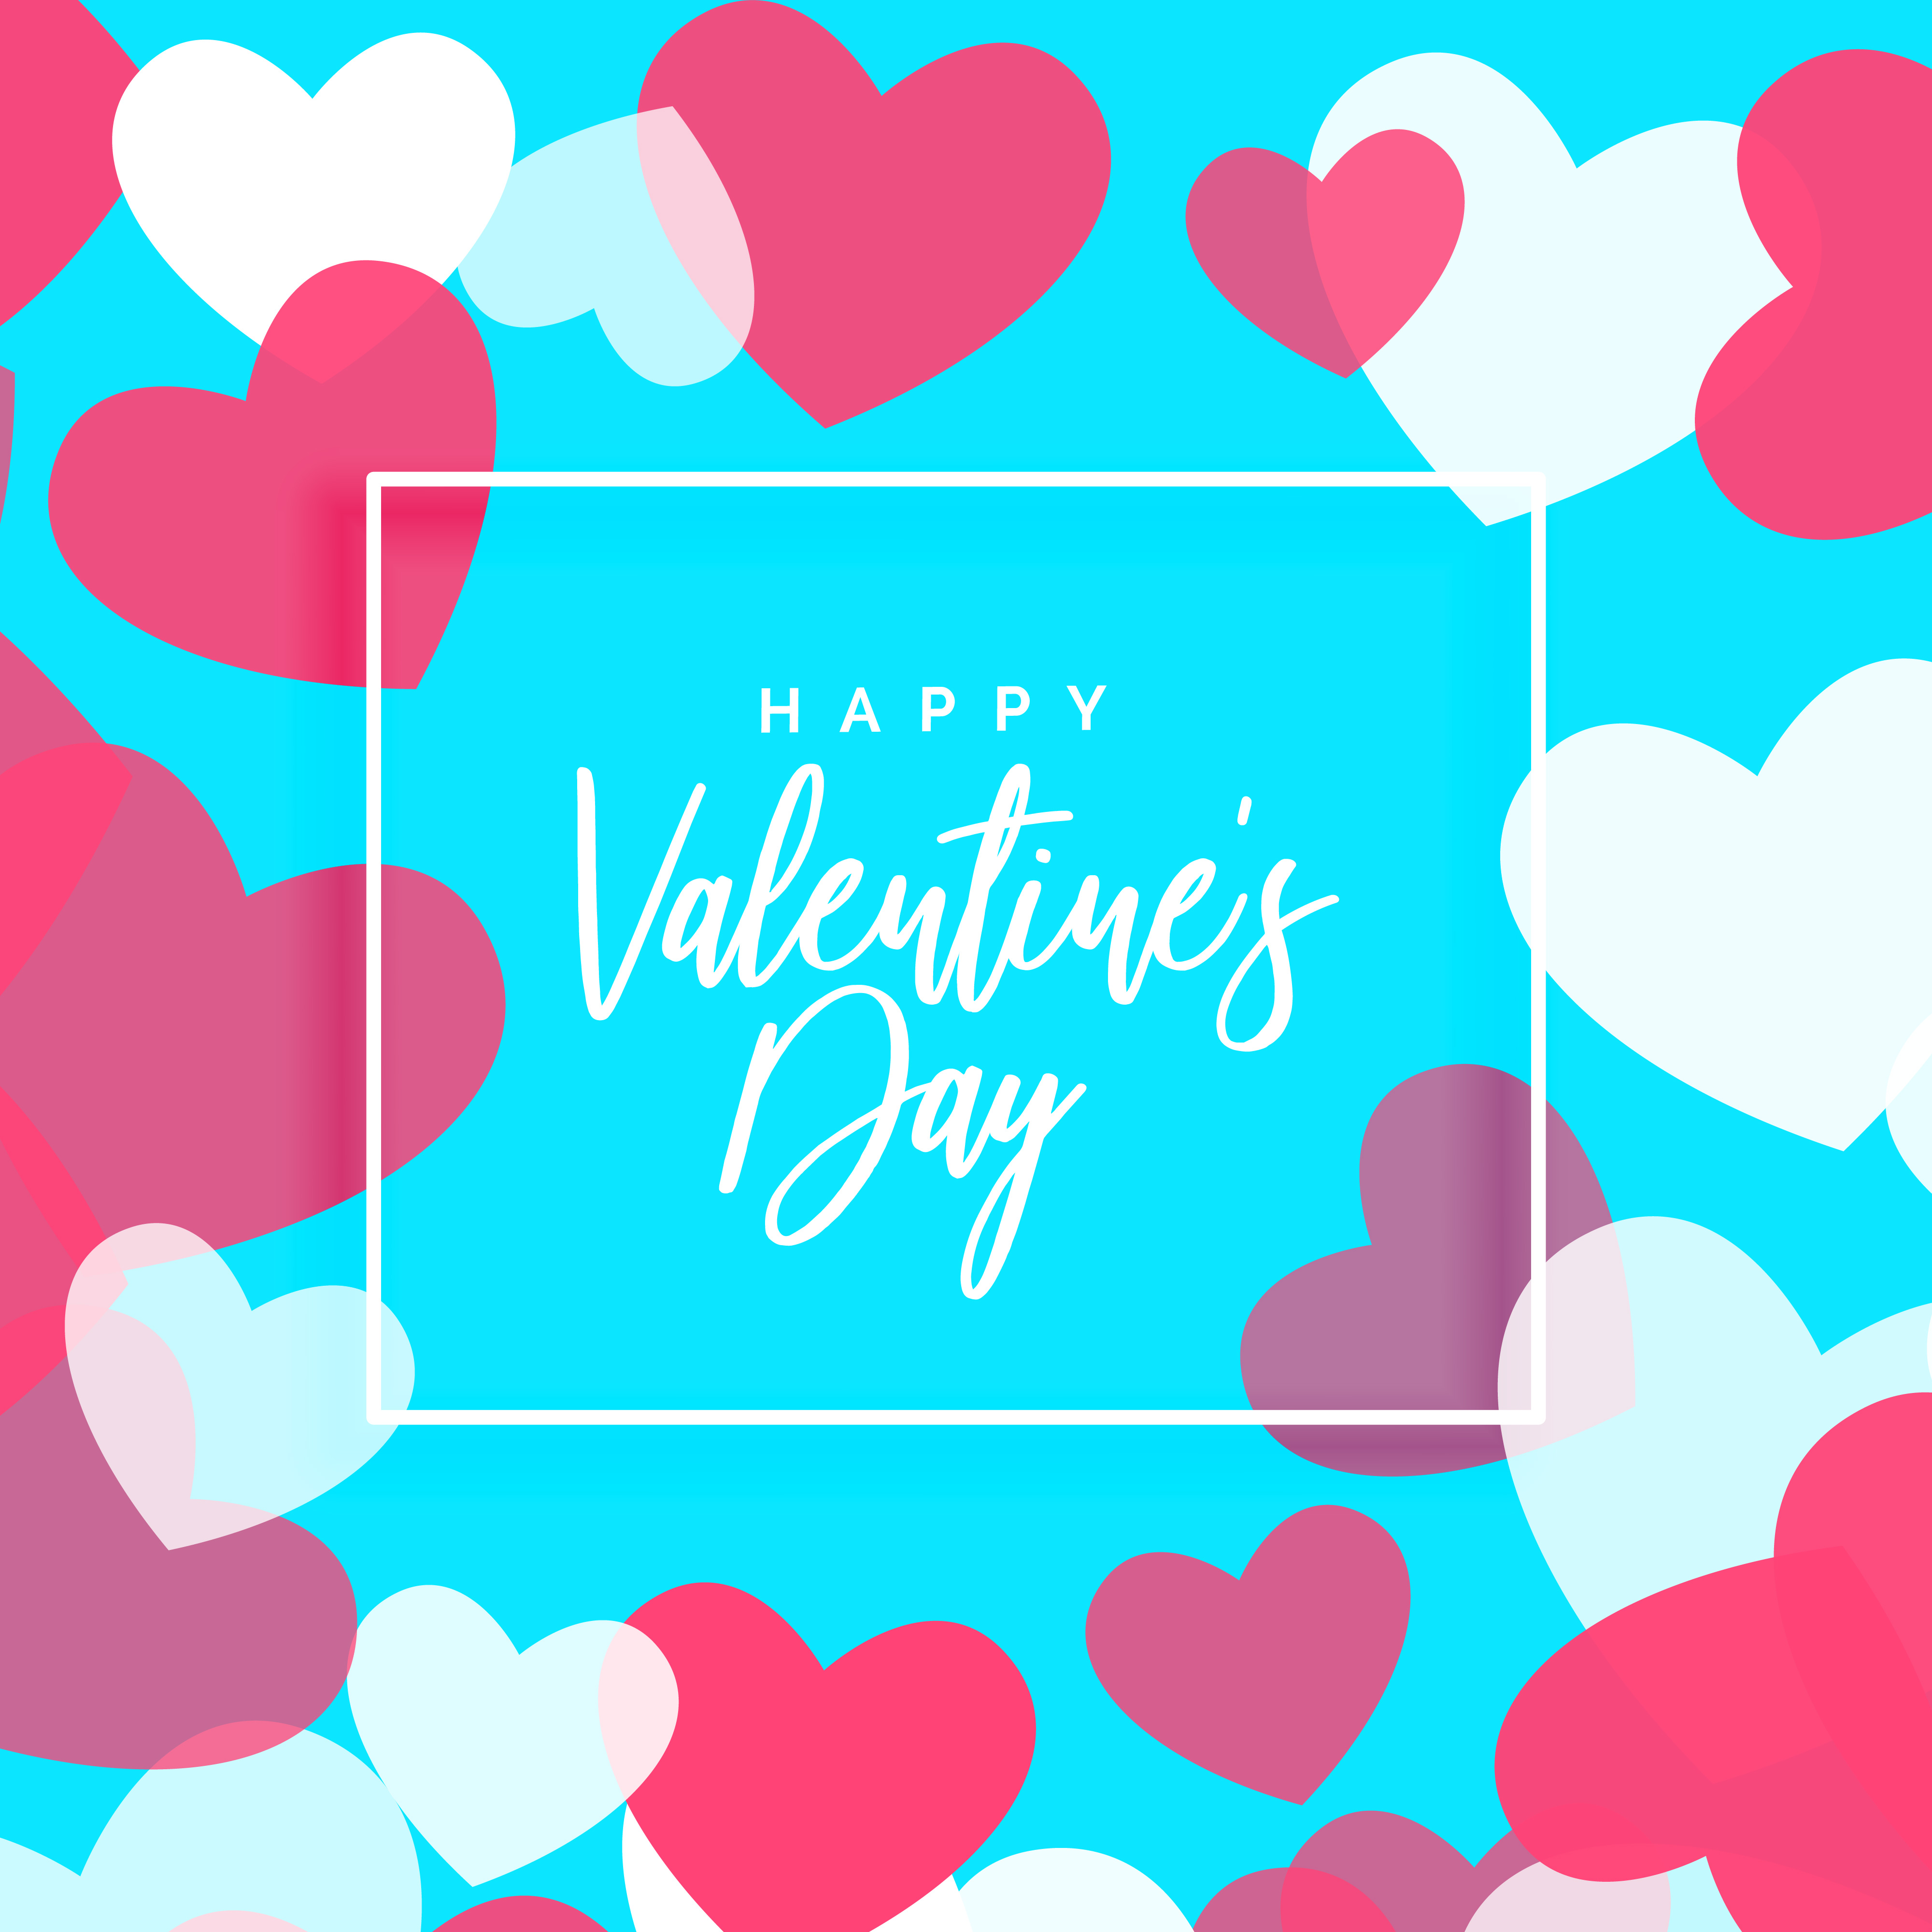 valentine 39 s day greeting design with hearts frame t l chargez de l 39 art des graphiques et des. Black Bedroom Furniture Sets. Home Design Ideas